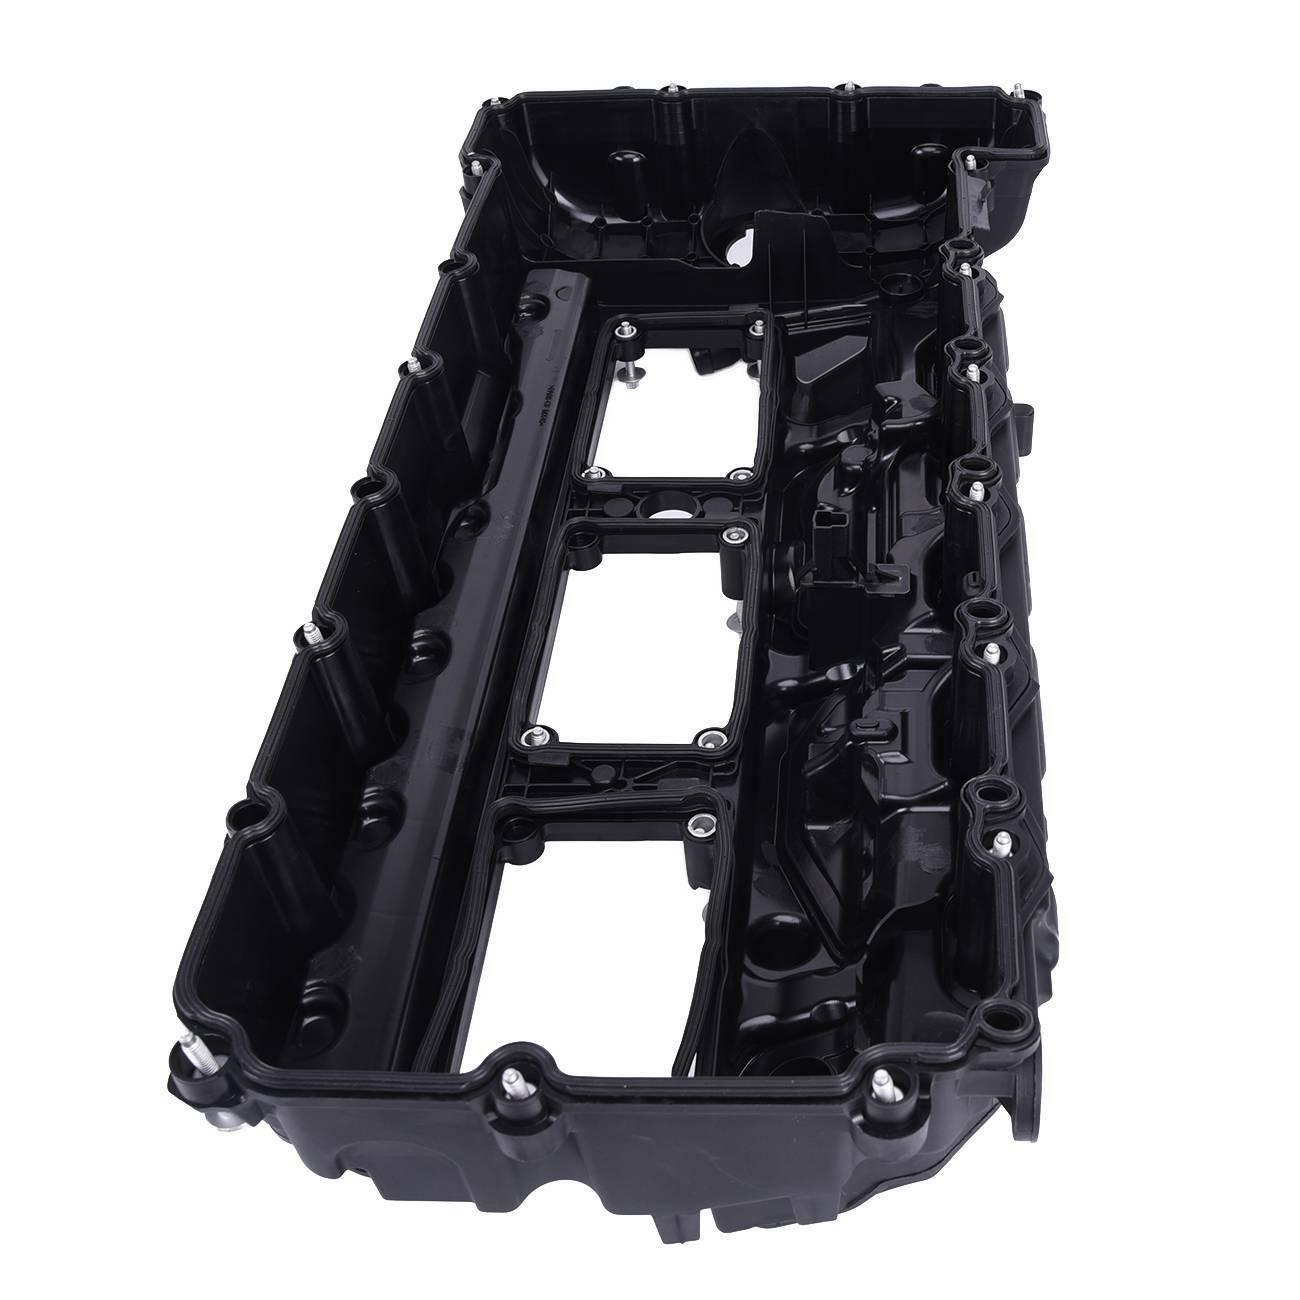 N55 Engine Cylinder Head Valve Cover W/ Gasket For BMW 1 2